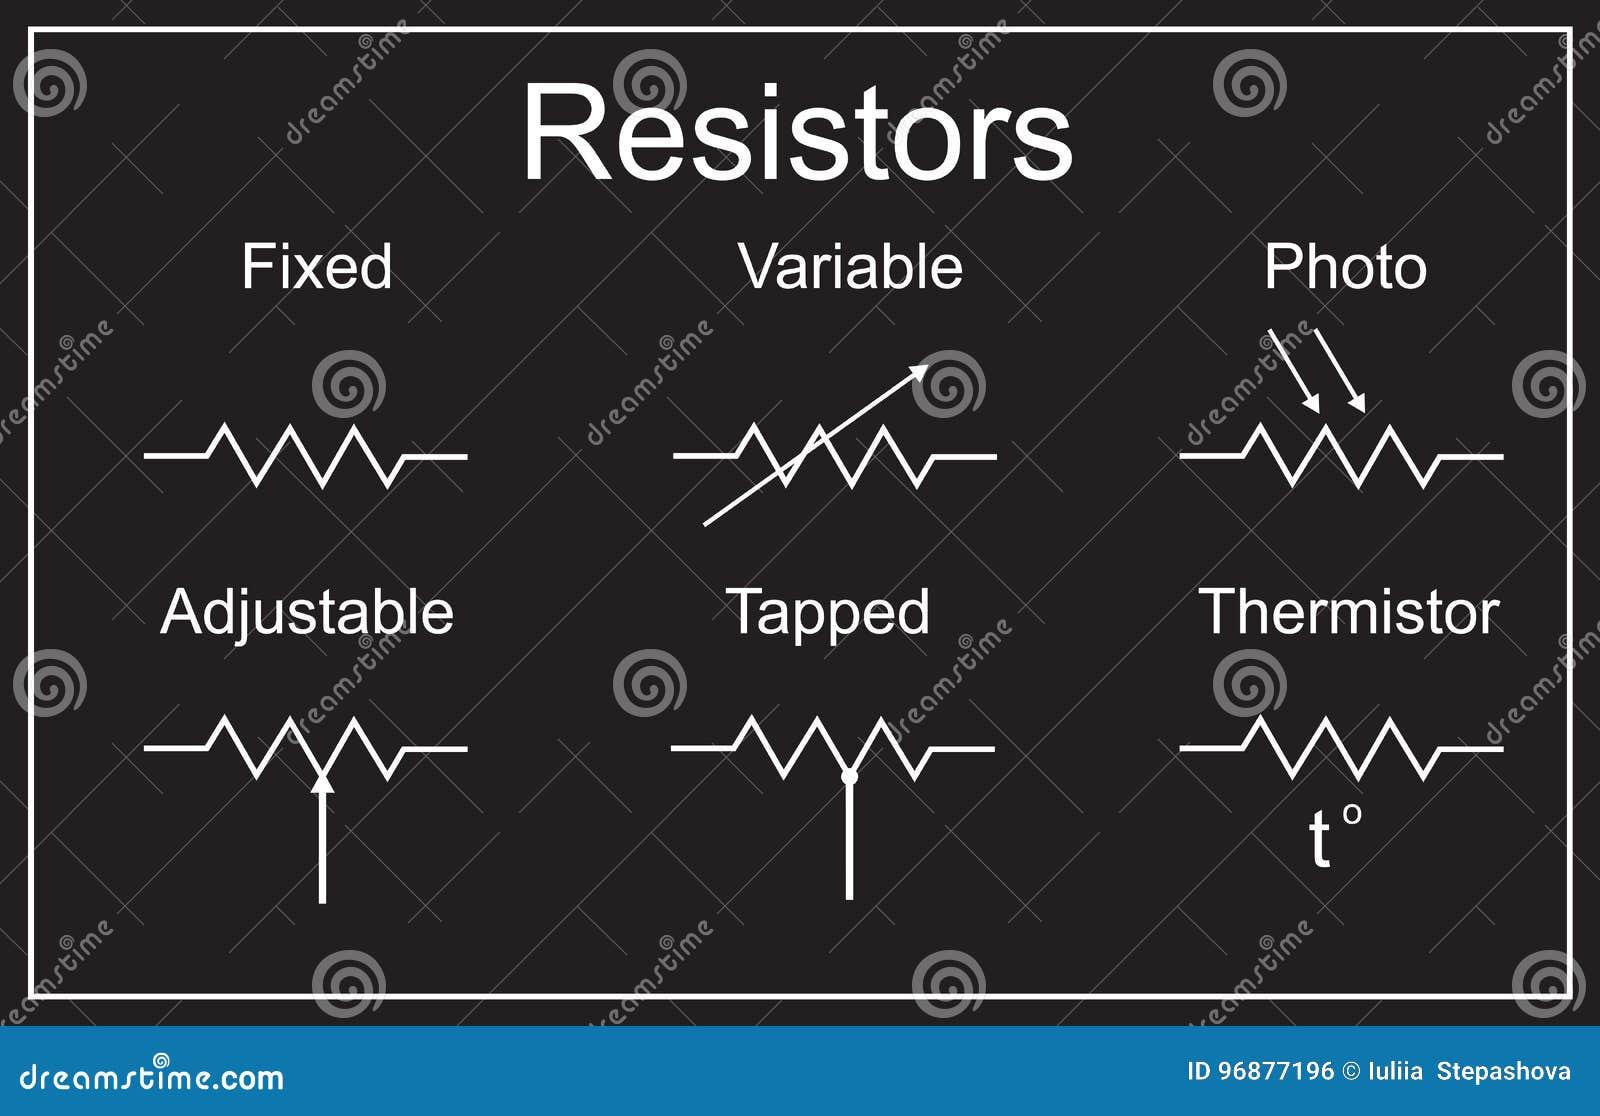 Electrical Wiring Diagram Symbols Wiring Diagram Template